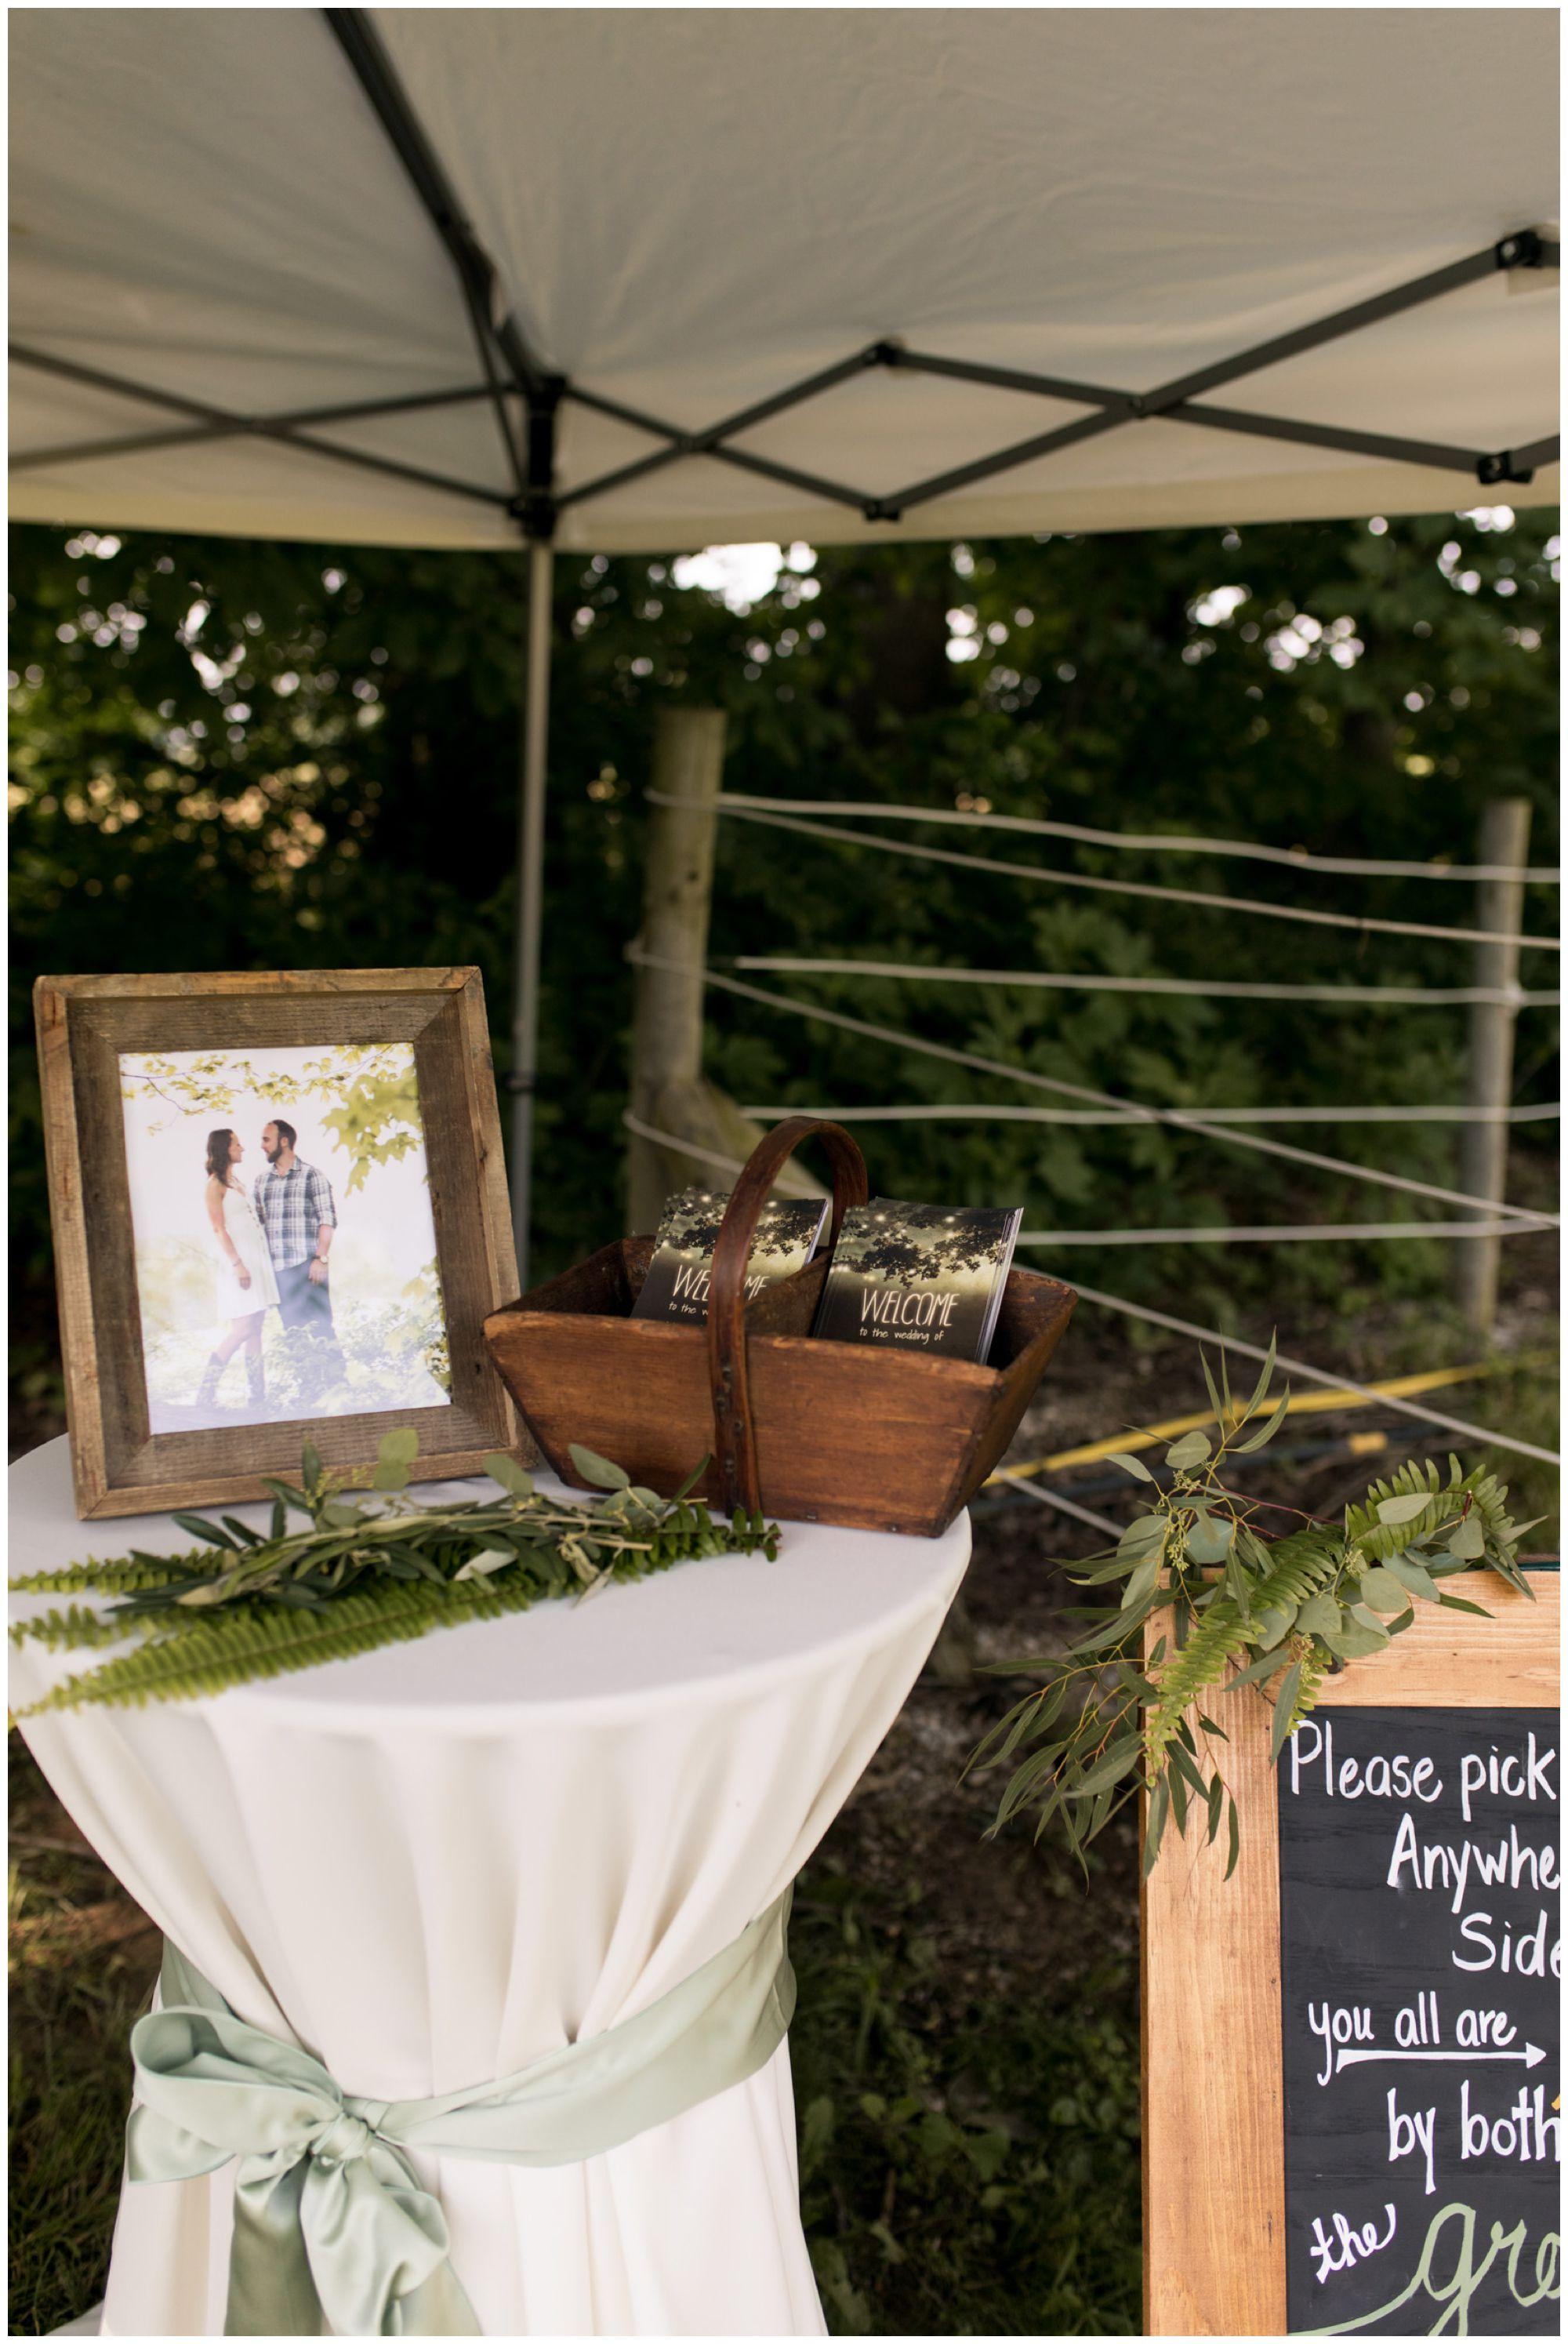 Indianapolis rustic backyard wedding ceremony decor